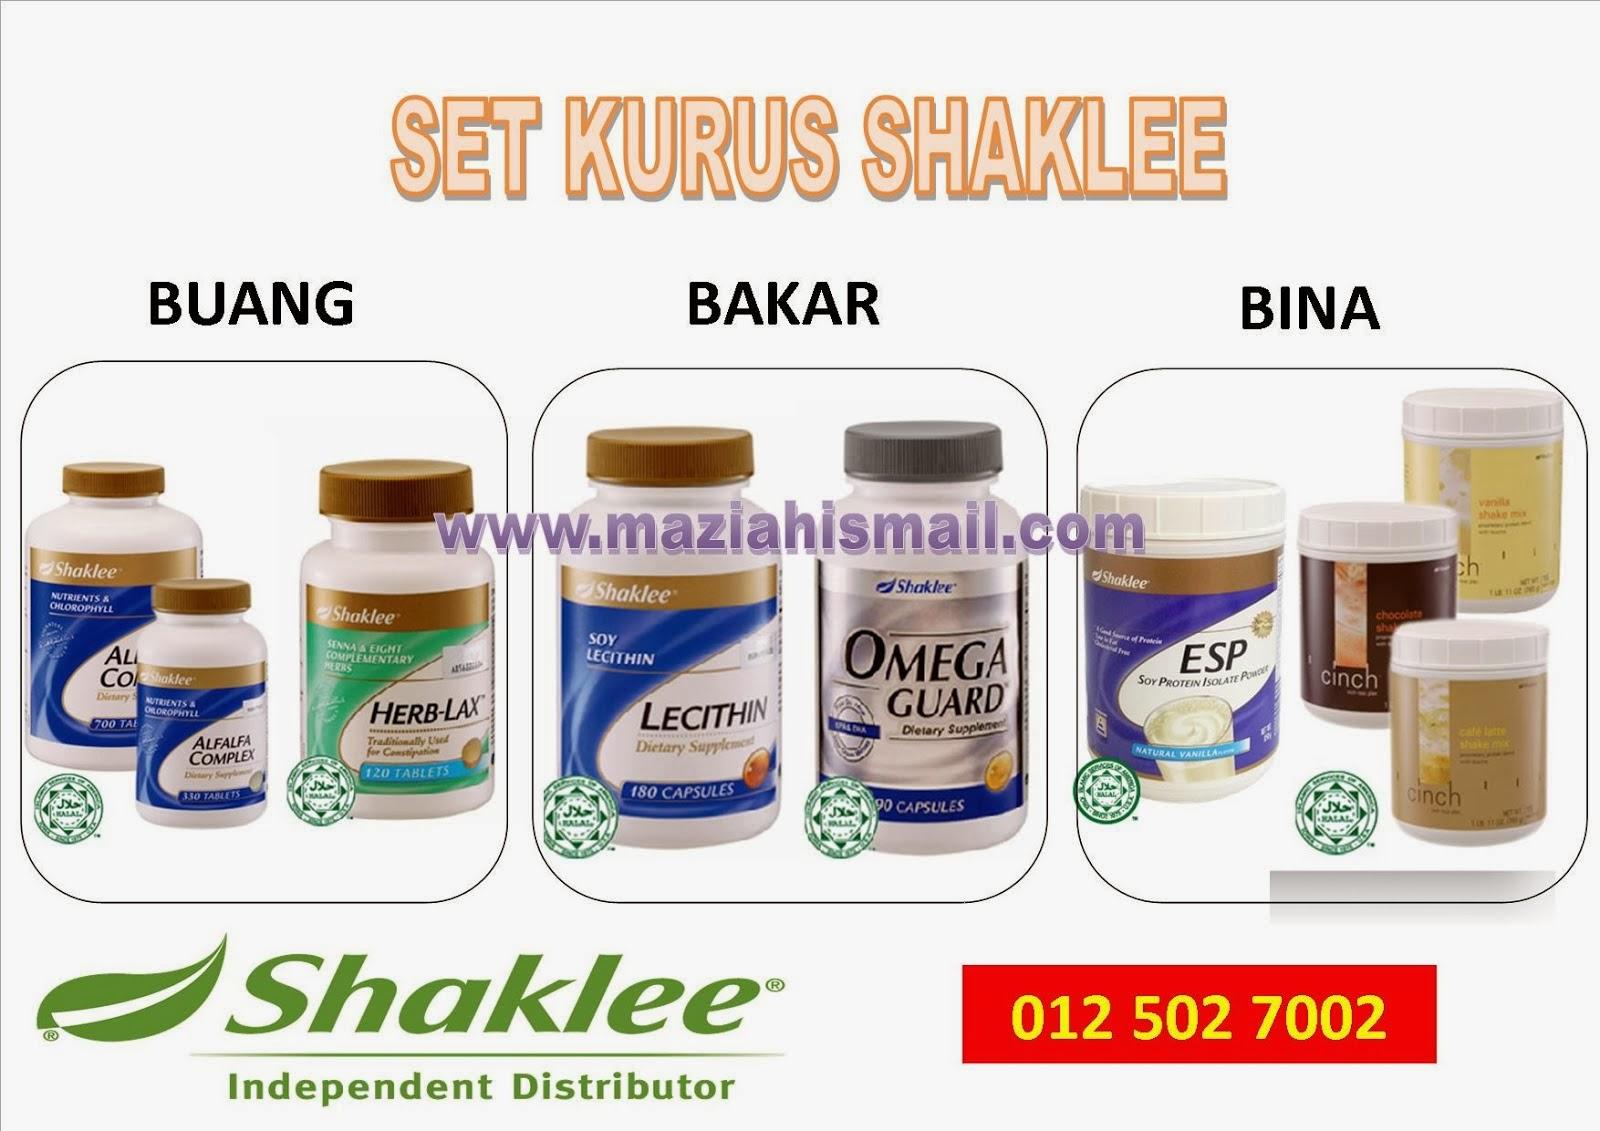 Set Kurus Shaklee